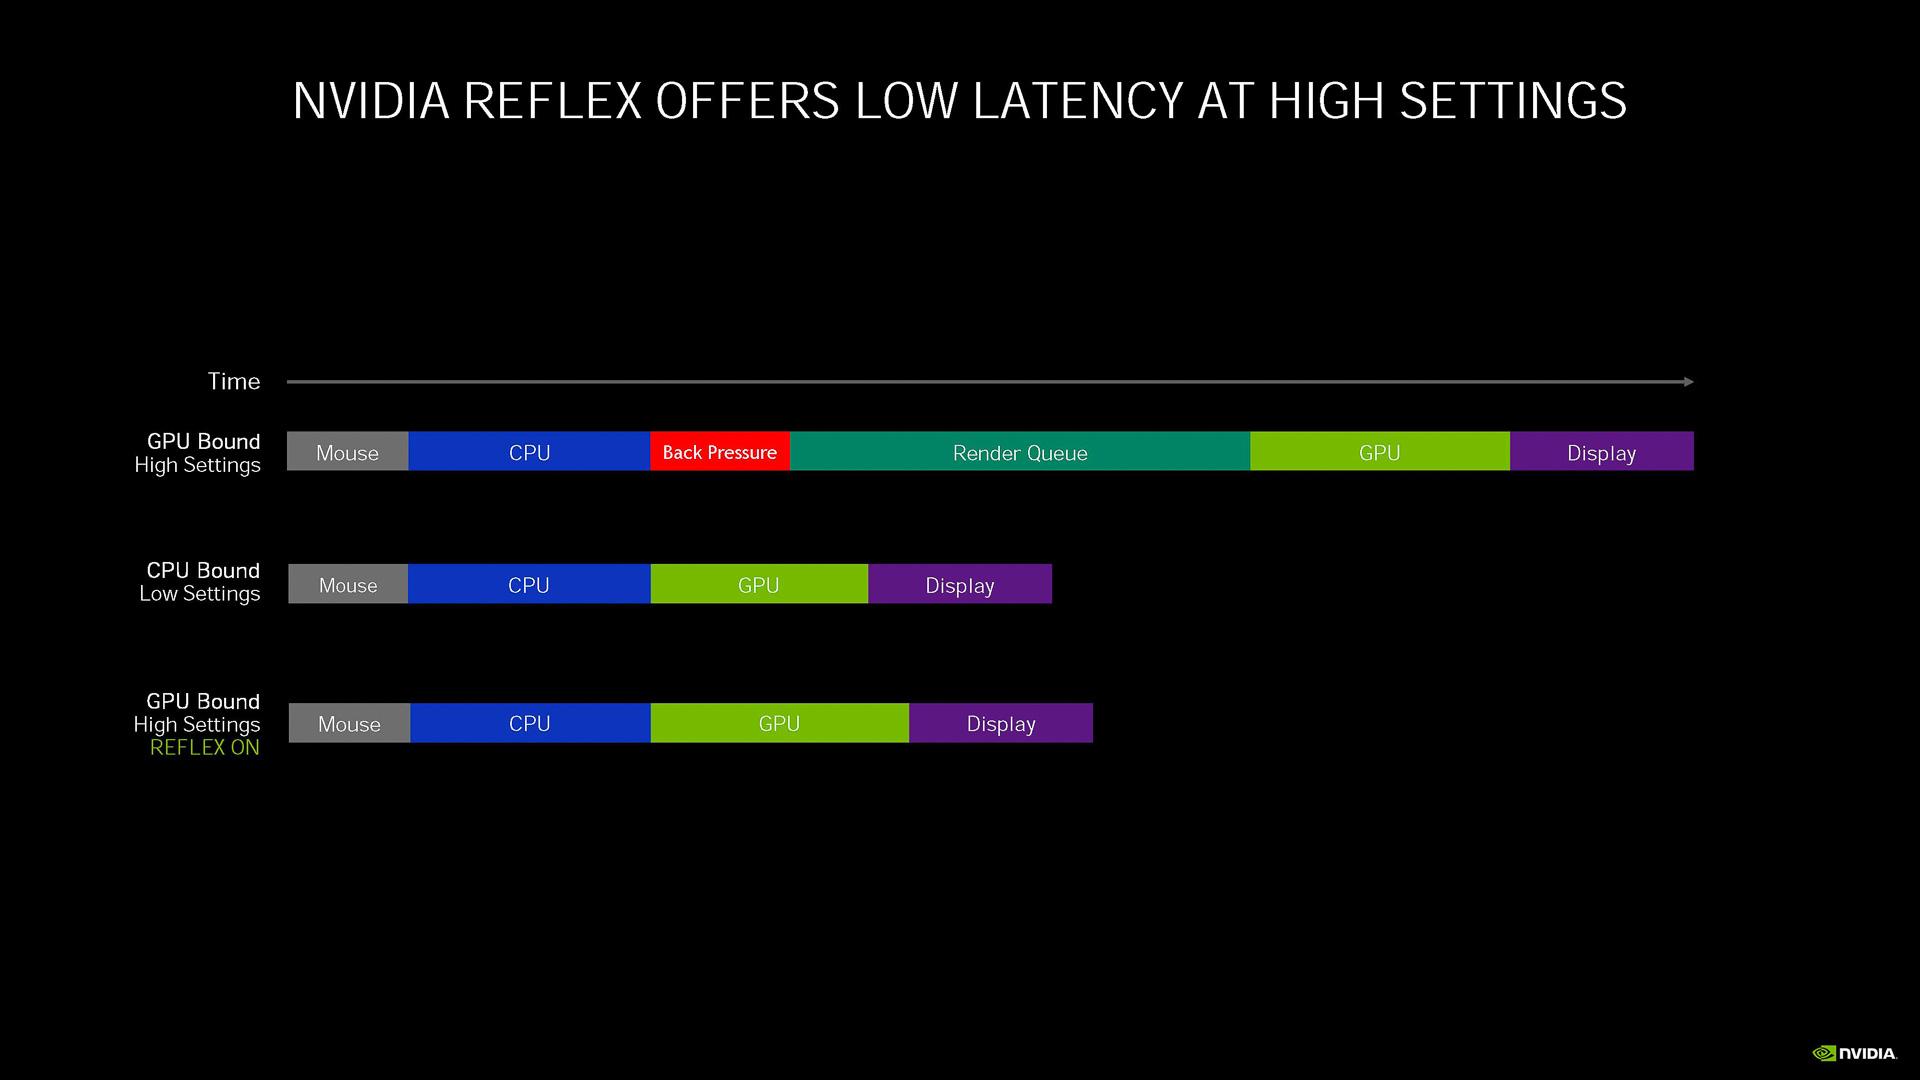 Reflexを有効にするとレンダーキューを大幅に削減できる